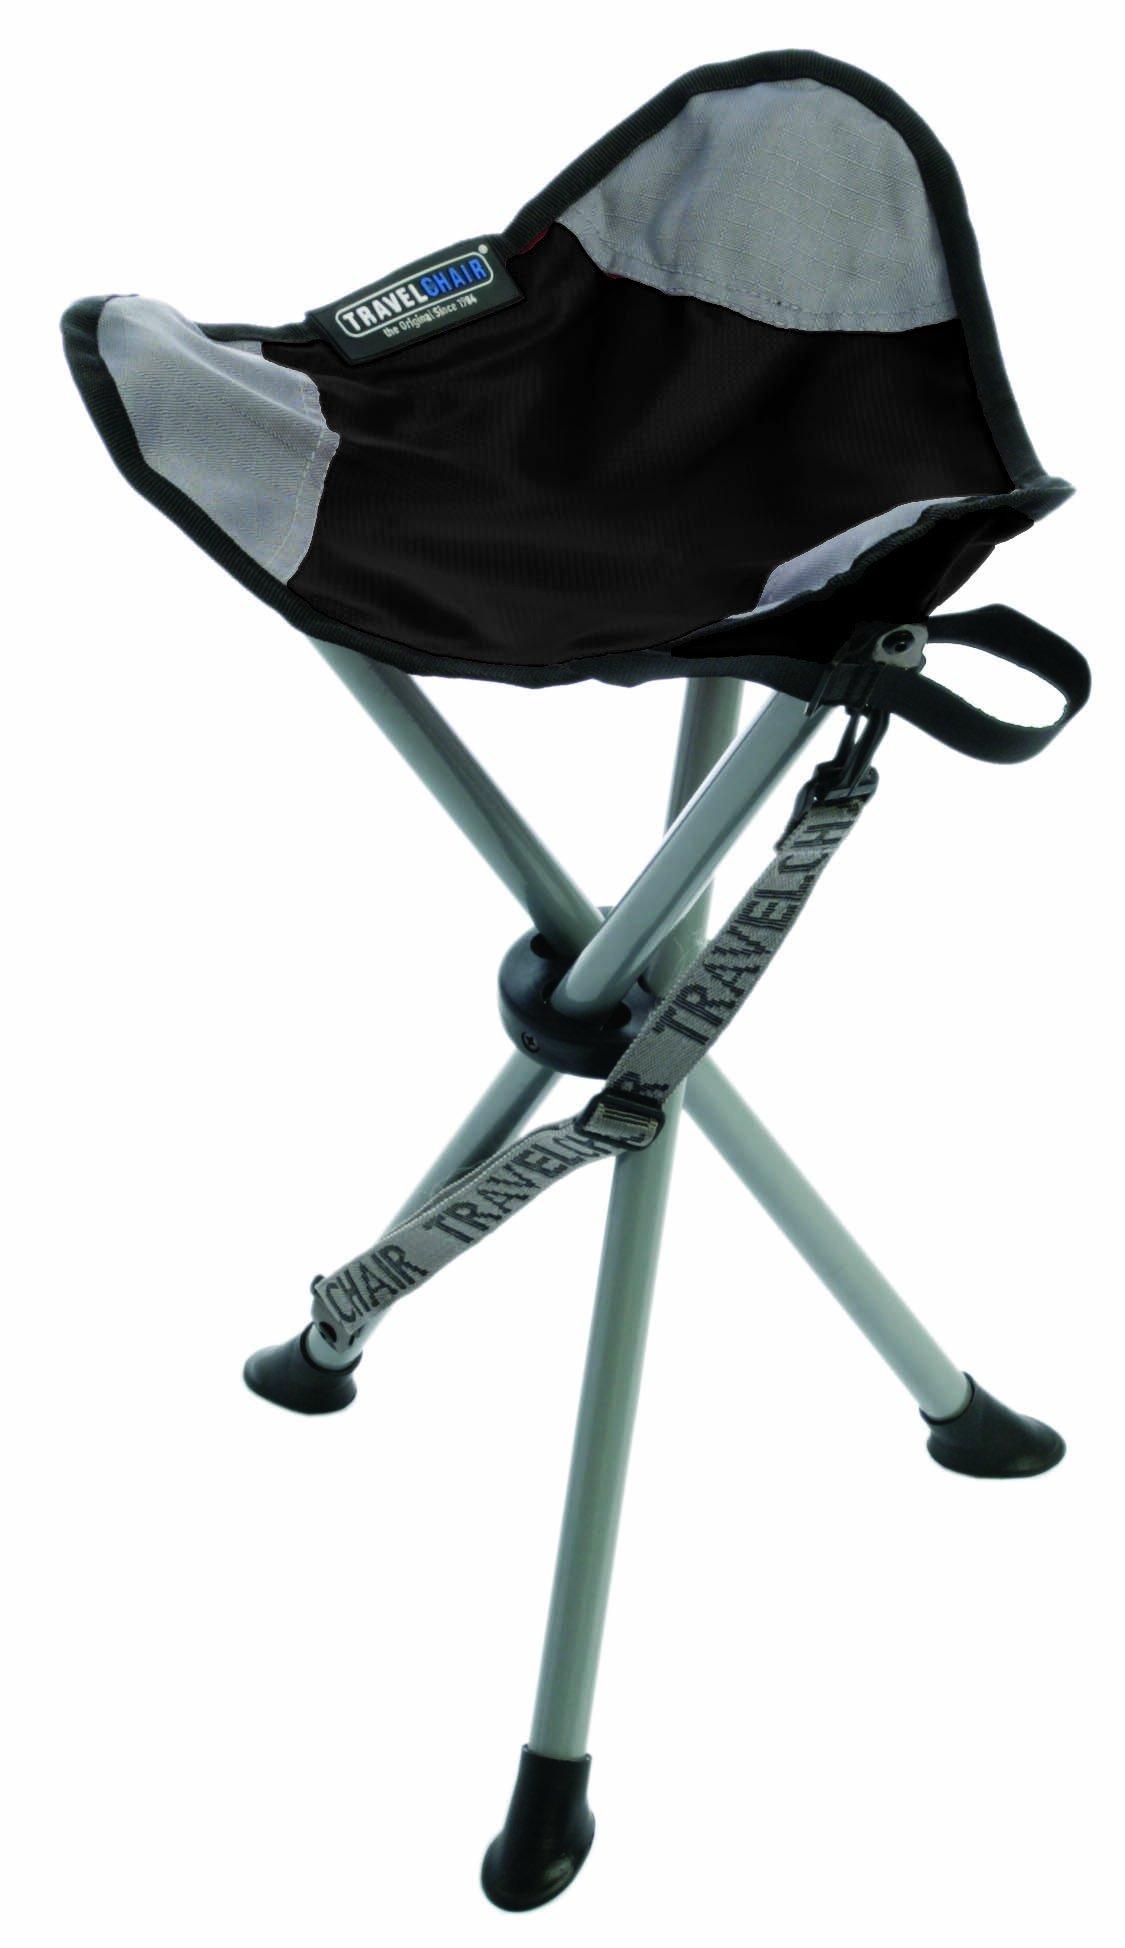 TravelChair Slacker Chair, Tripod Stool, Black by TravelChair